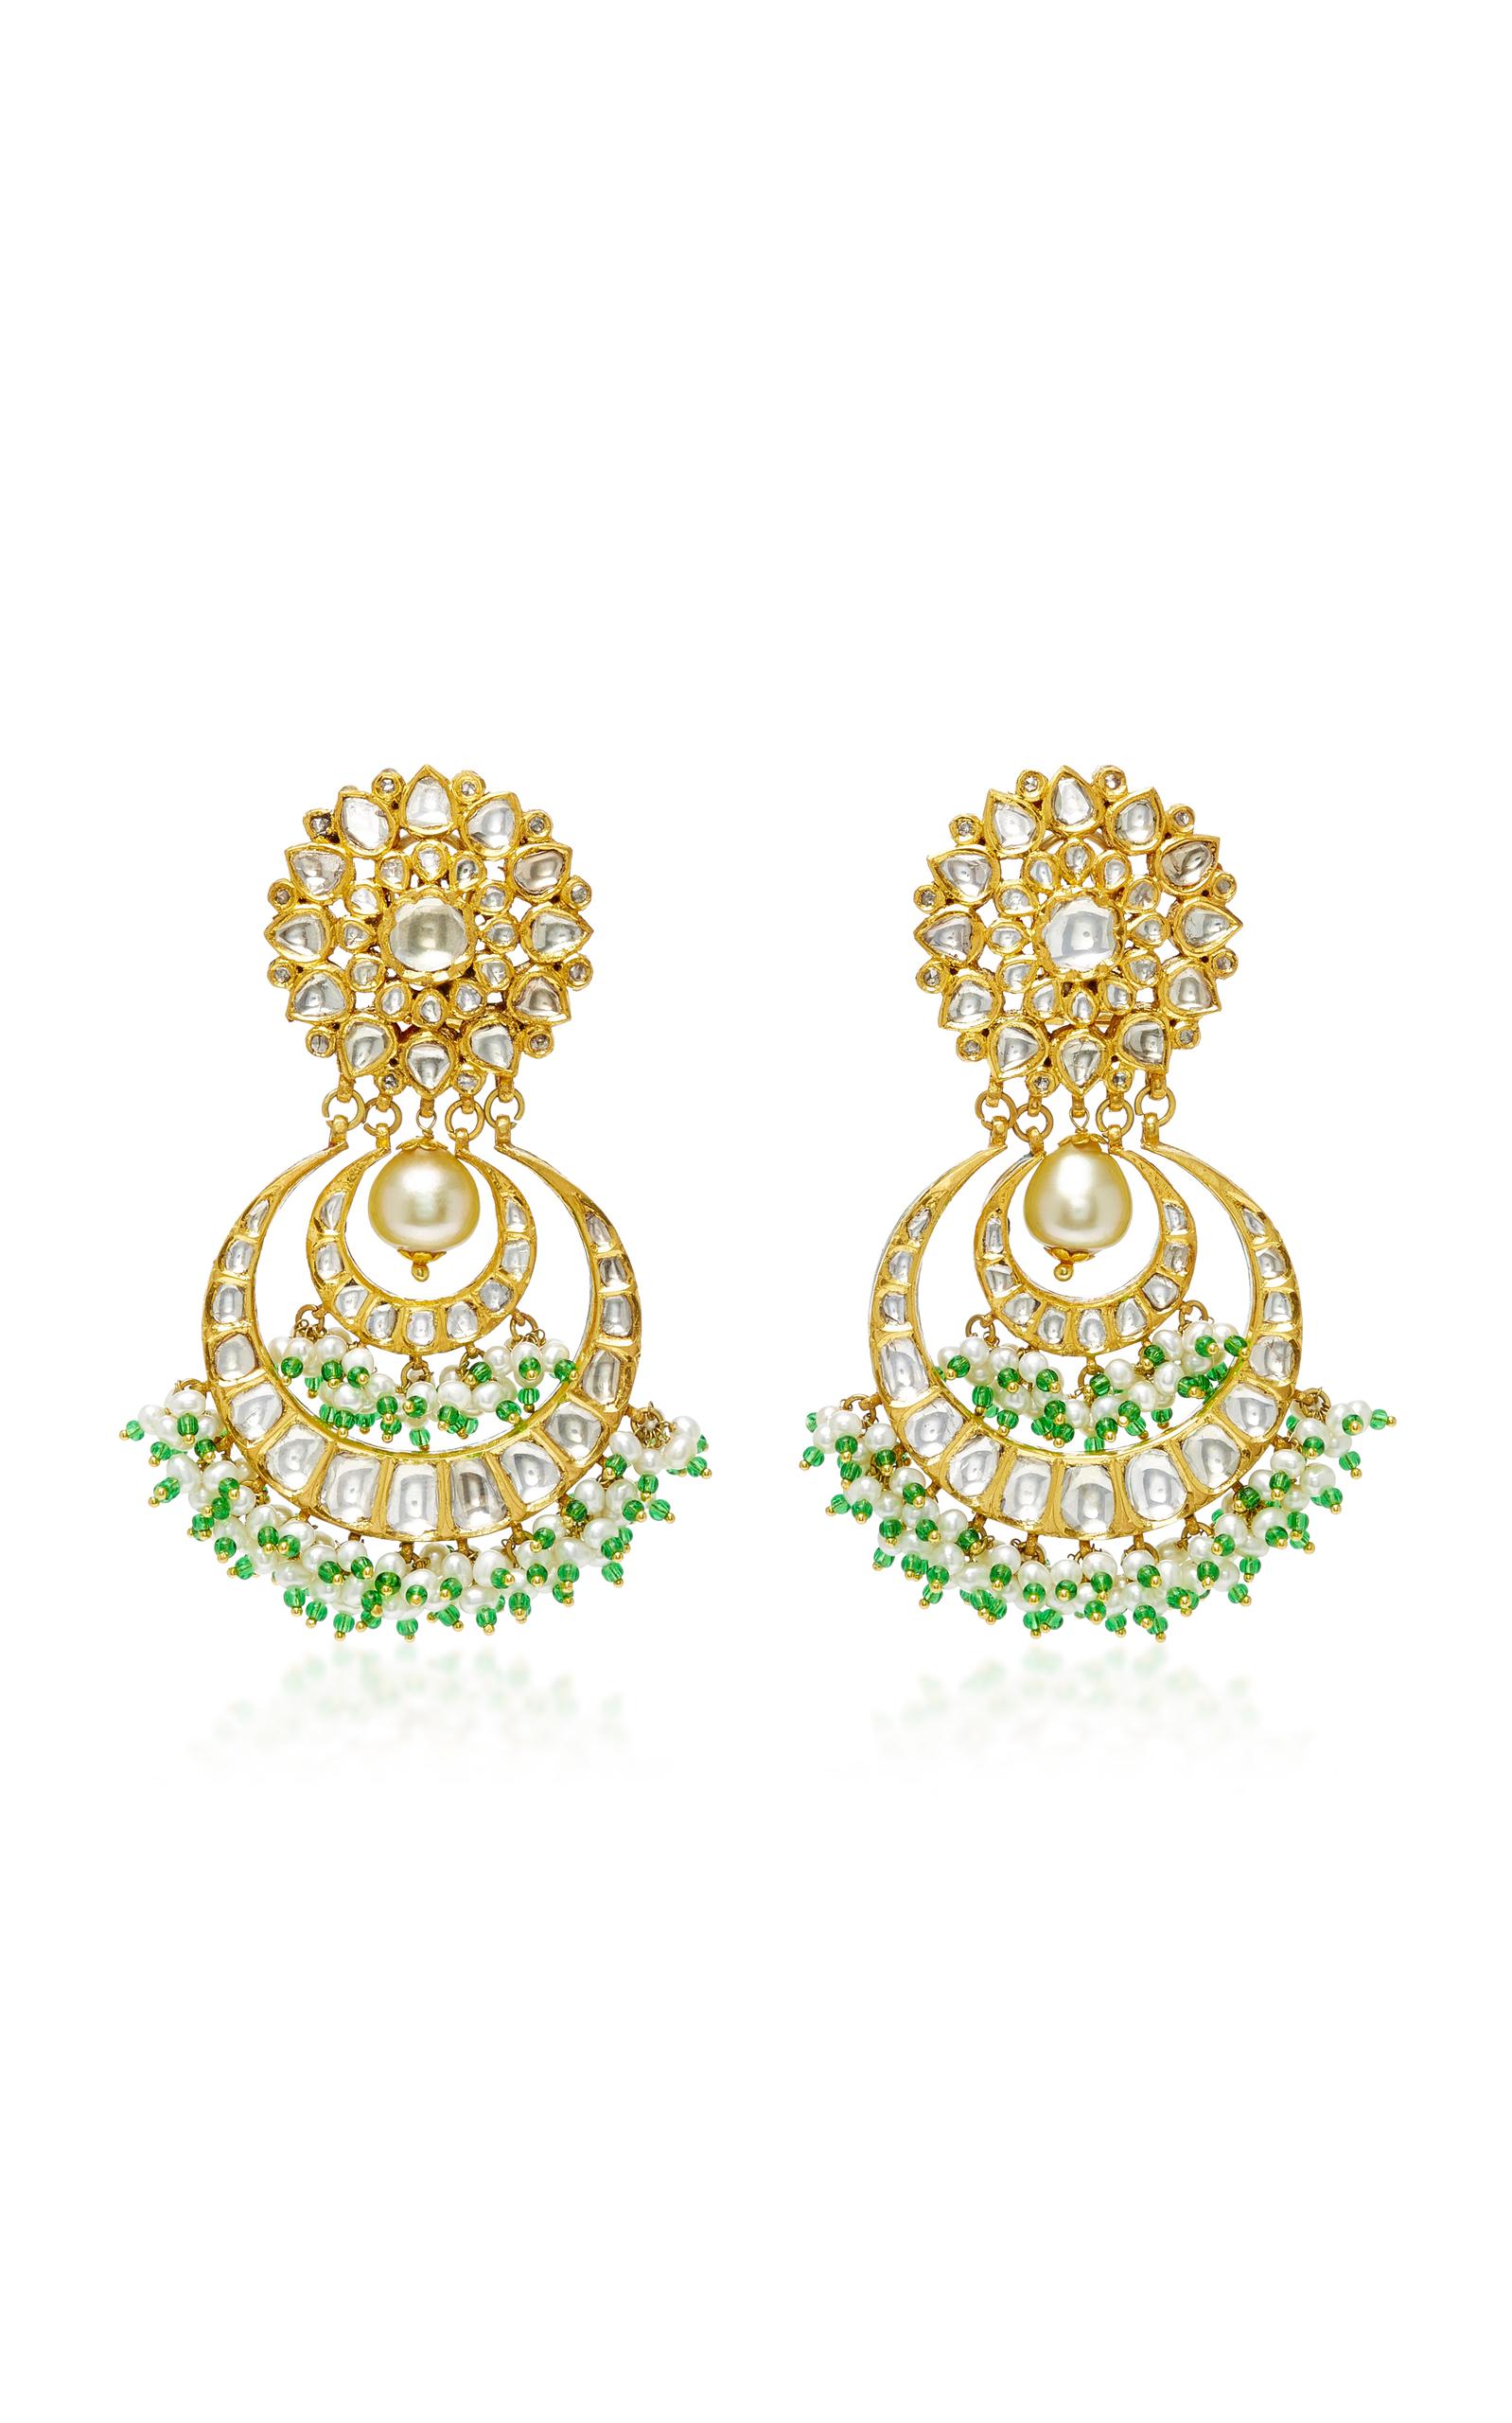 22k Diamant D'or Et Boucles D'oreilles Perle Sanjay Kasliwal xOUVHa5rJ